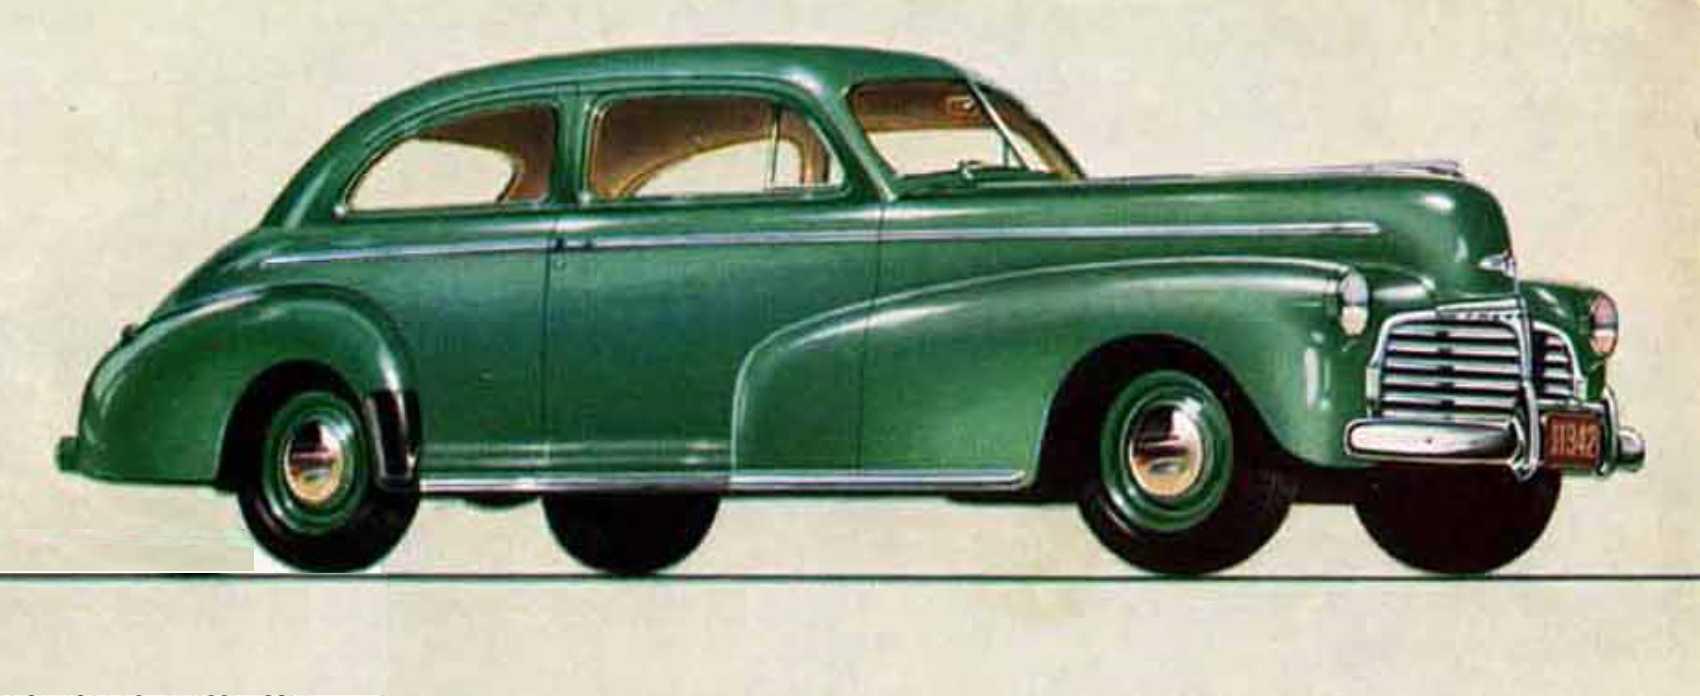 Chevrolet Master Deluxe Town Sedan 3.5 Manual, 91hp, 1942